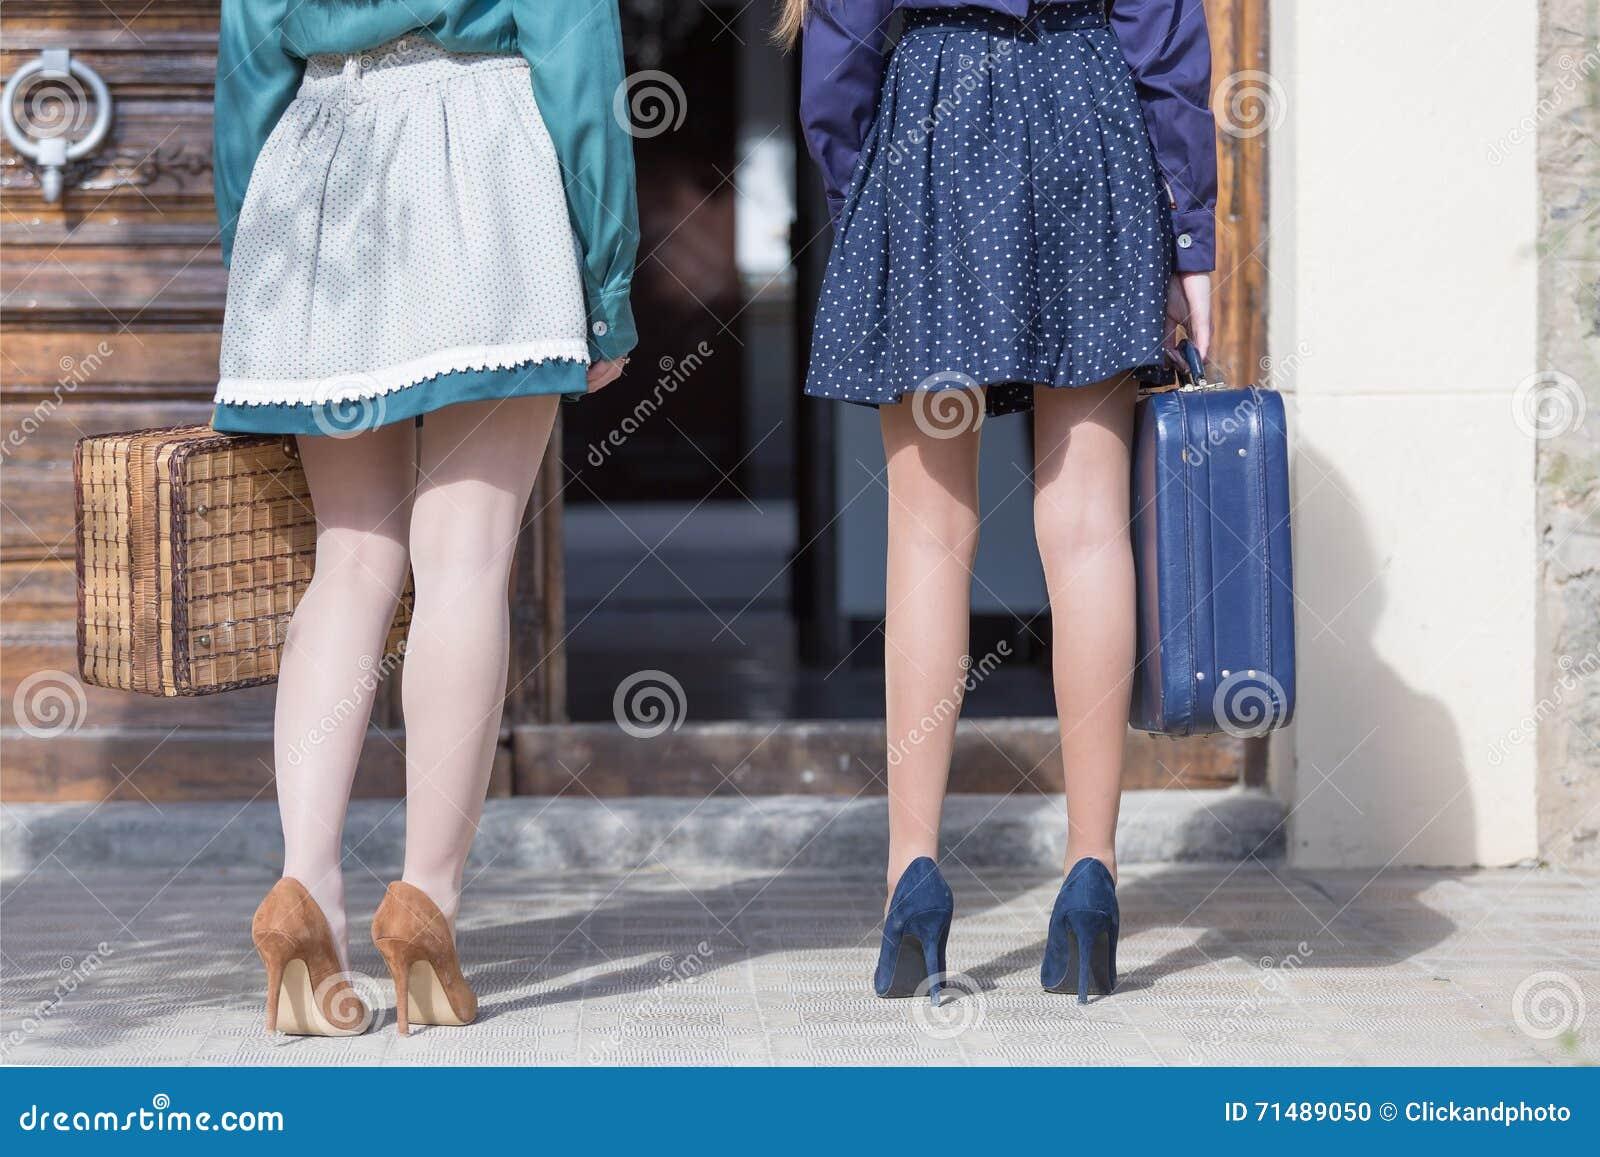 Women On High Heels